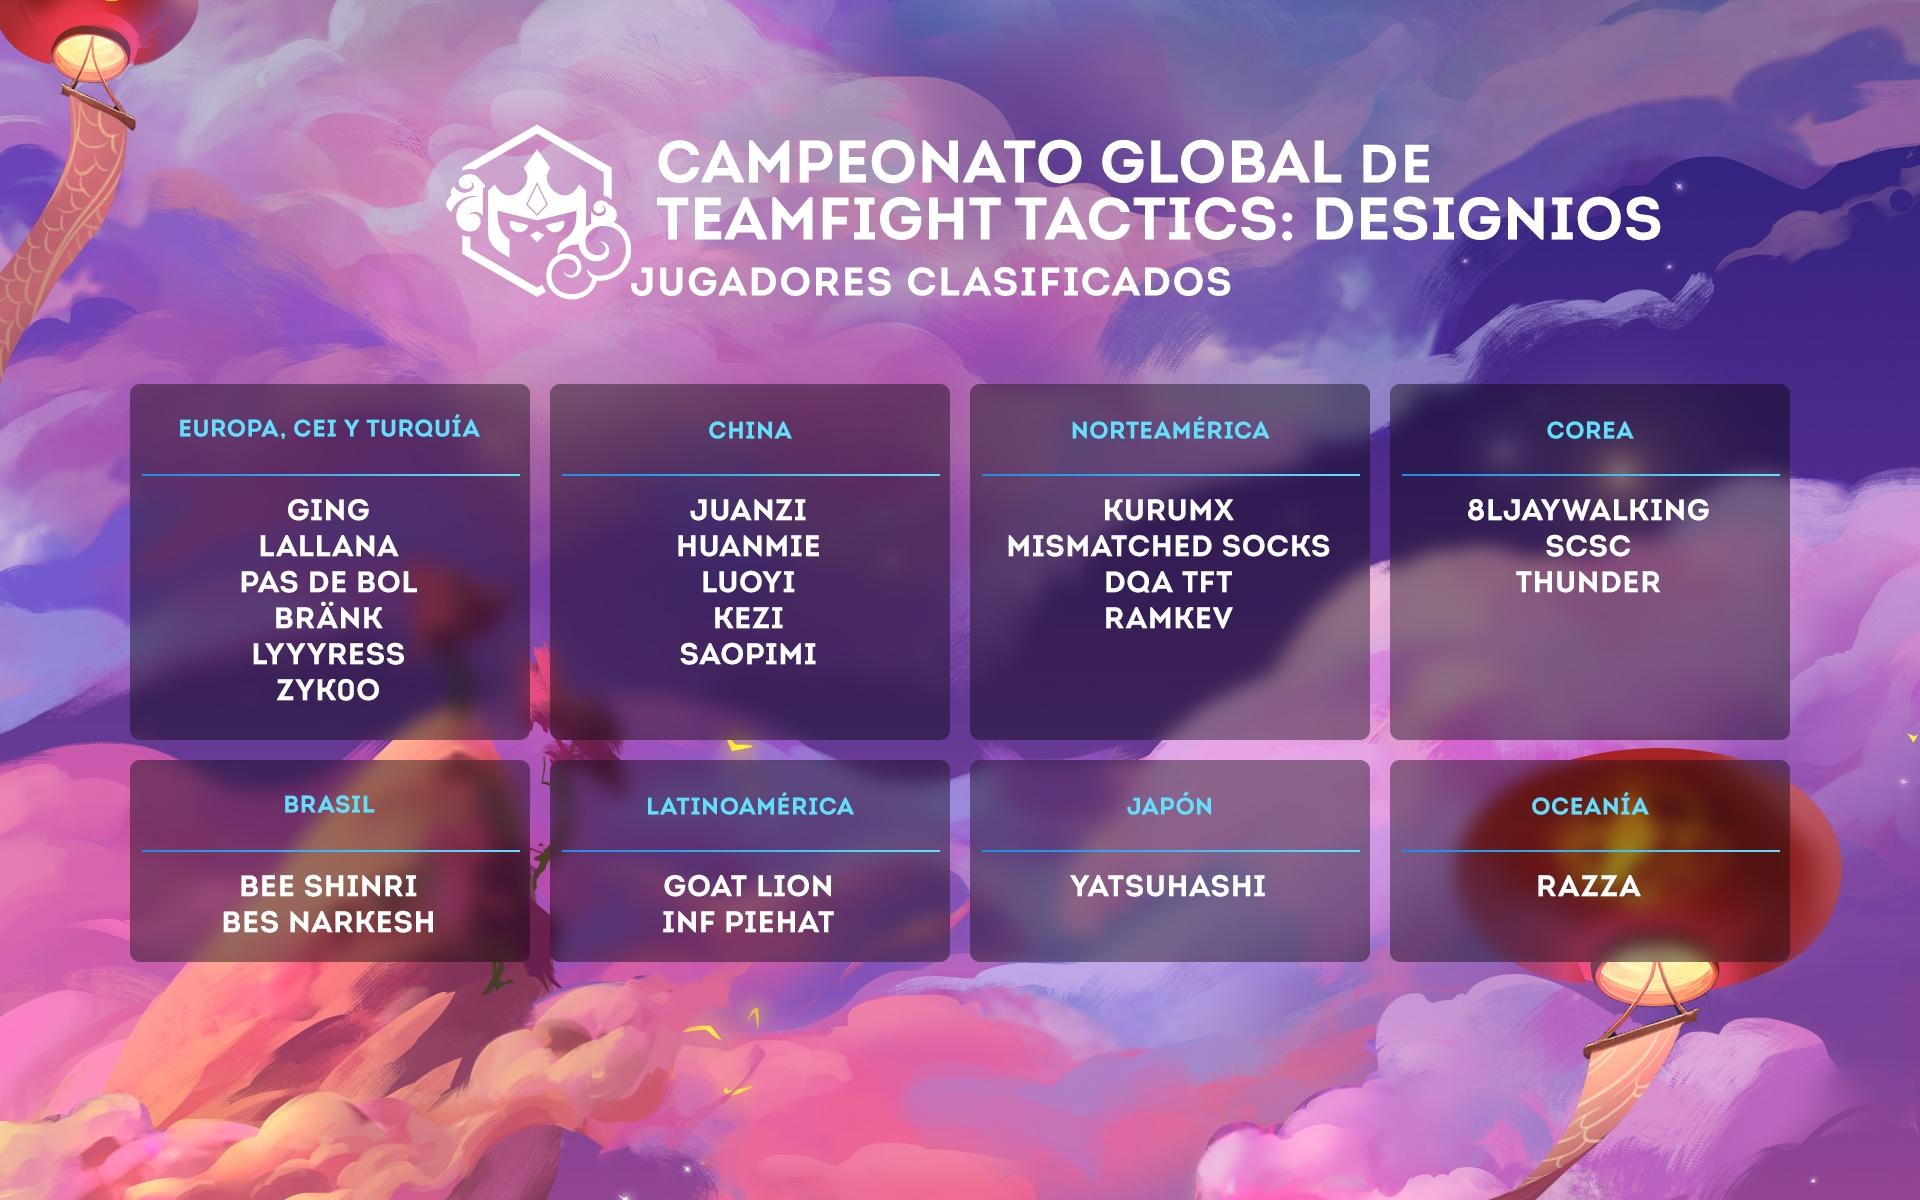 01-TFT-Competitors_v2_LATAM.jpg